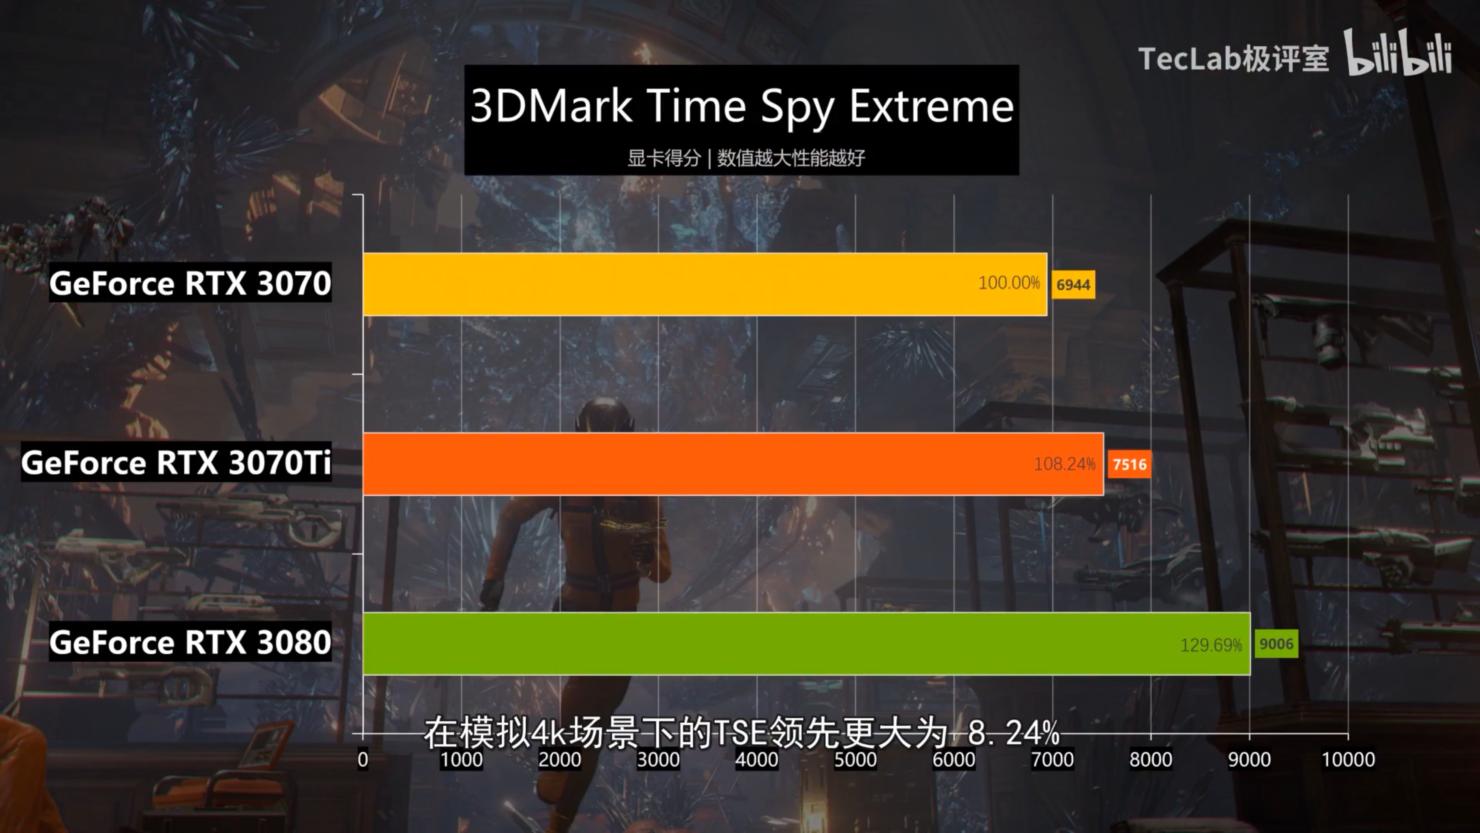 nvidia-geforce-rtx-3070-ti-graphics-card-benchmark-performance-leak-_3dmark-time-spy-extreme